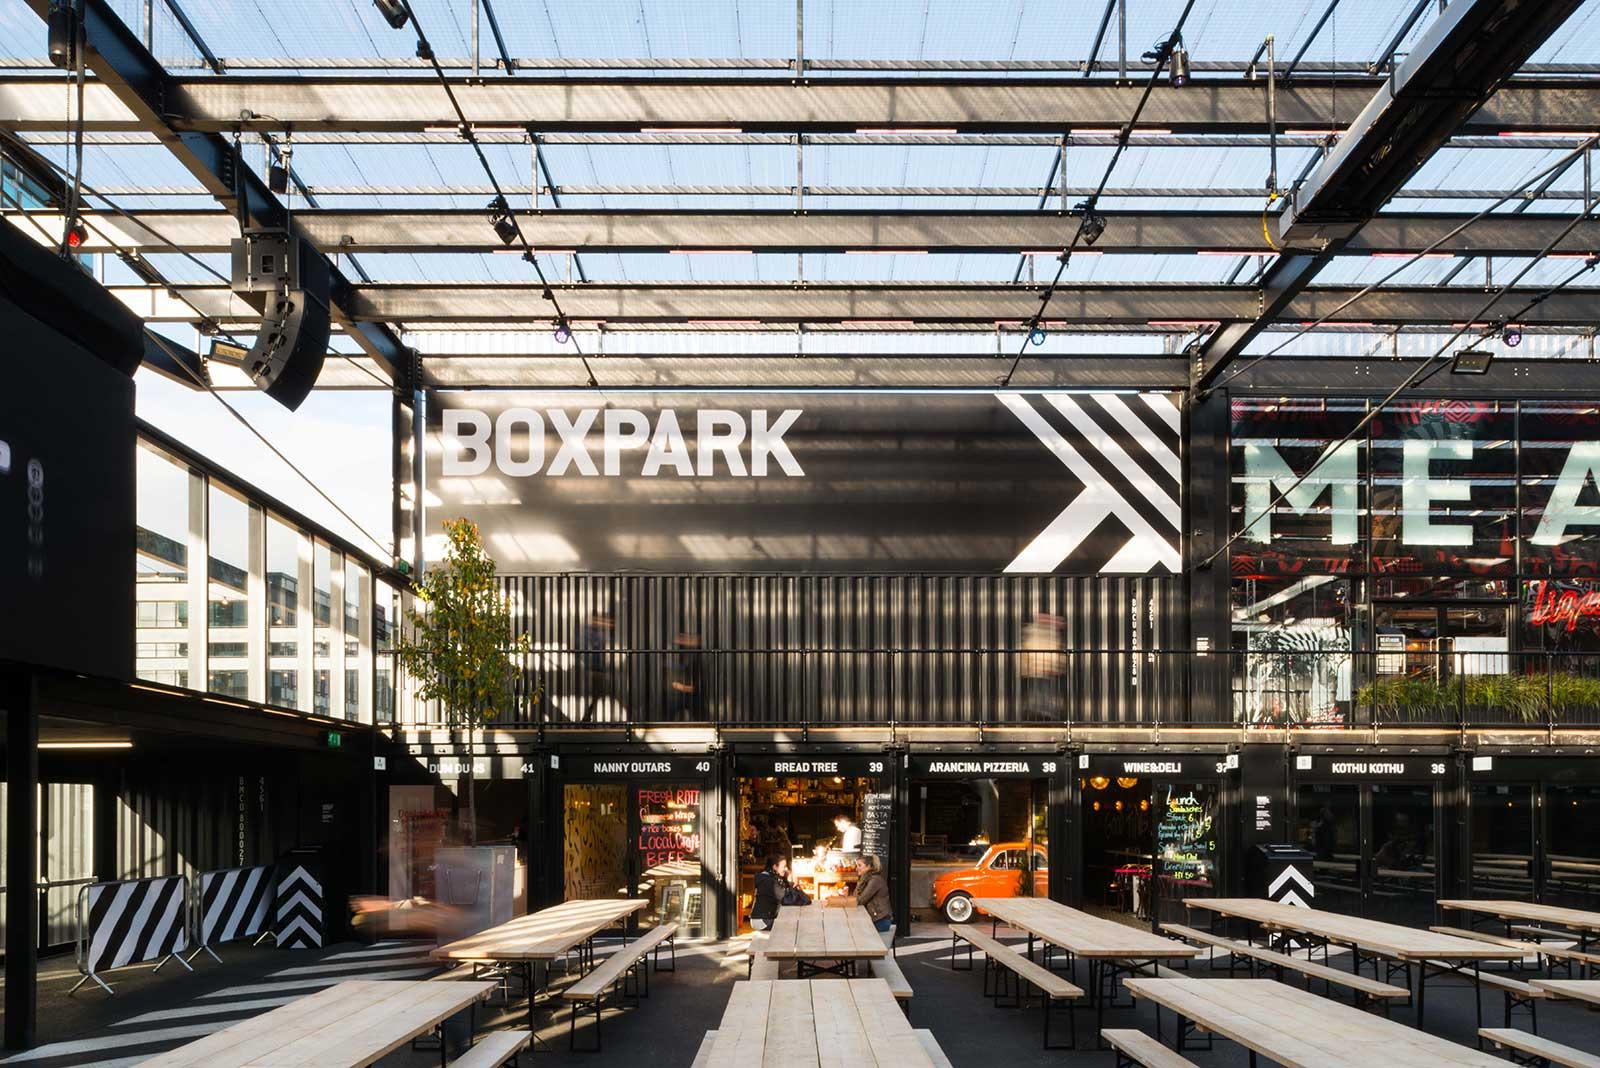 BOXPARK - Brinkworth